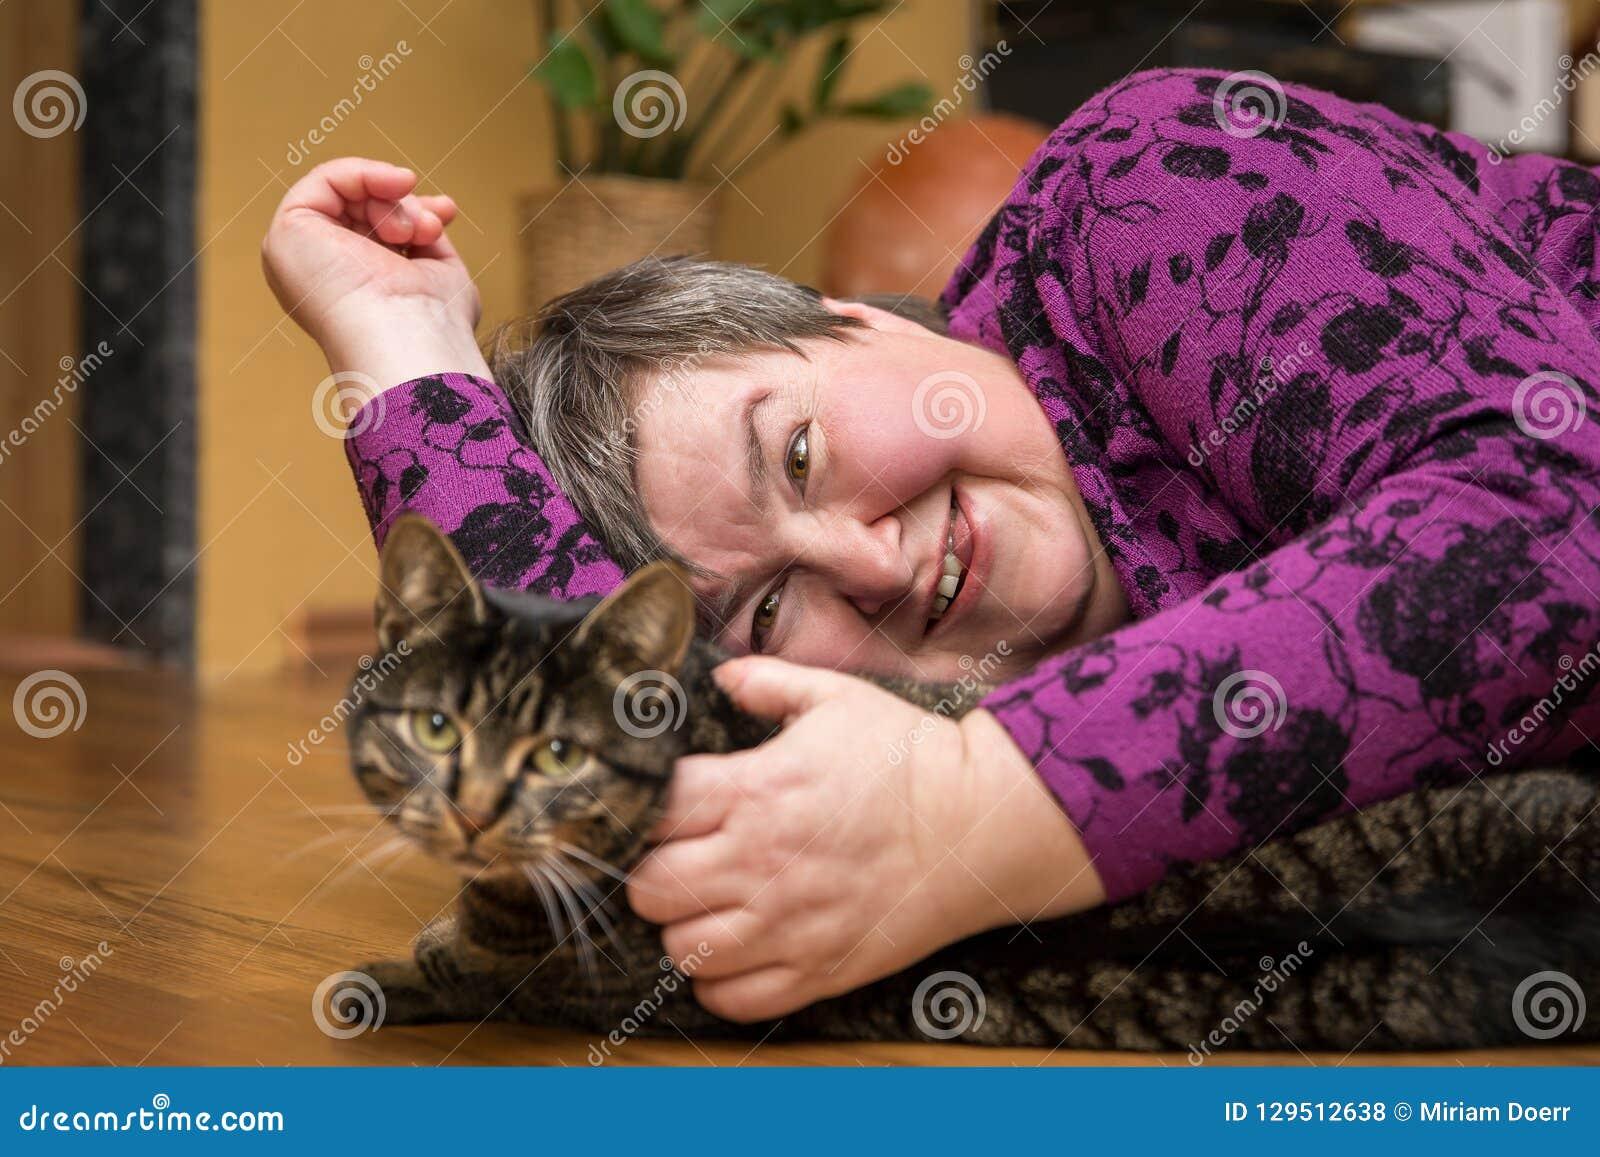 Mentalmente - mulher deficiente que afaga um gato, terapia ajudada animal